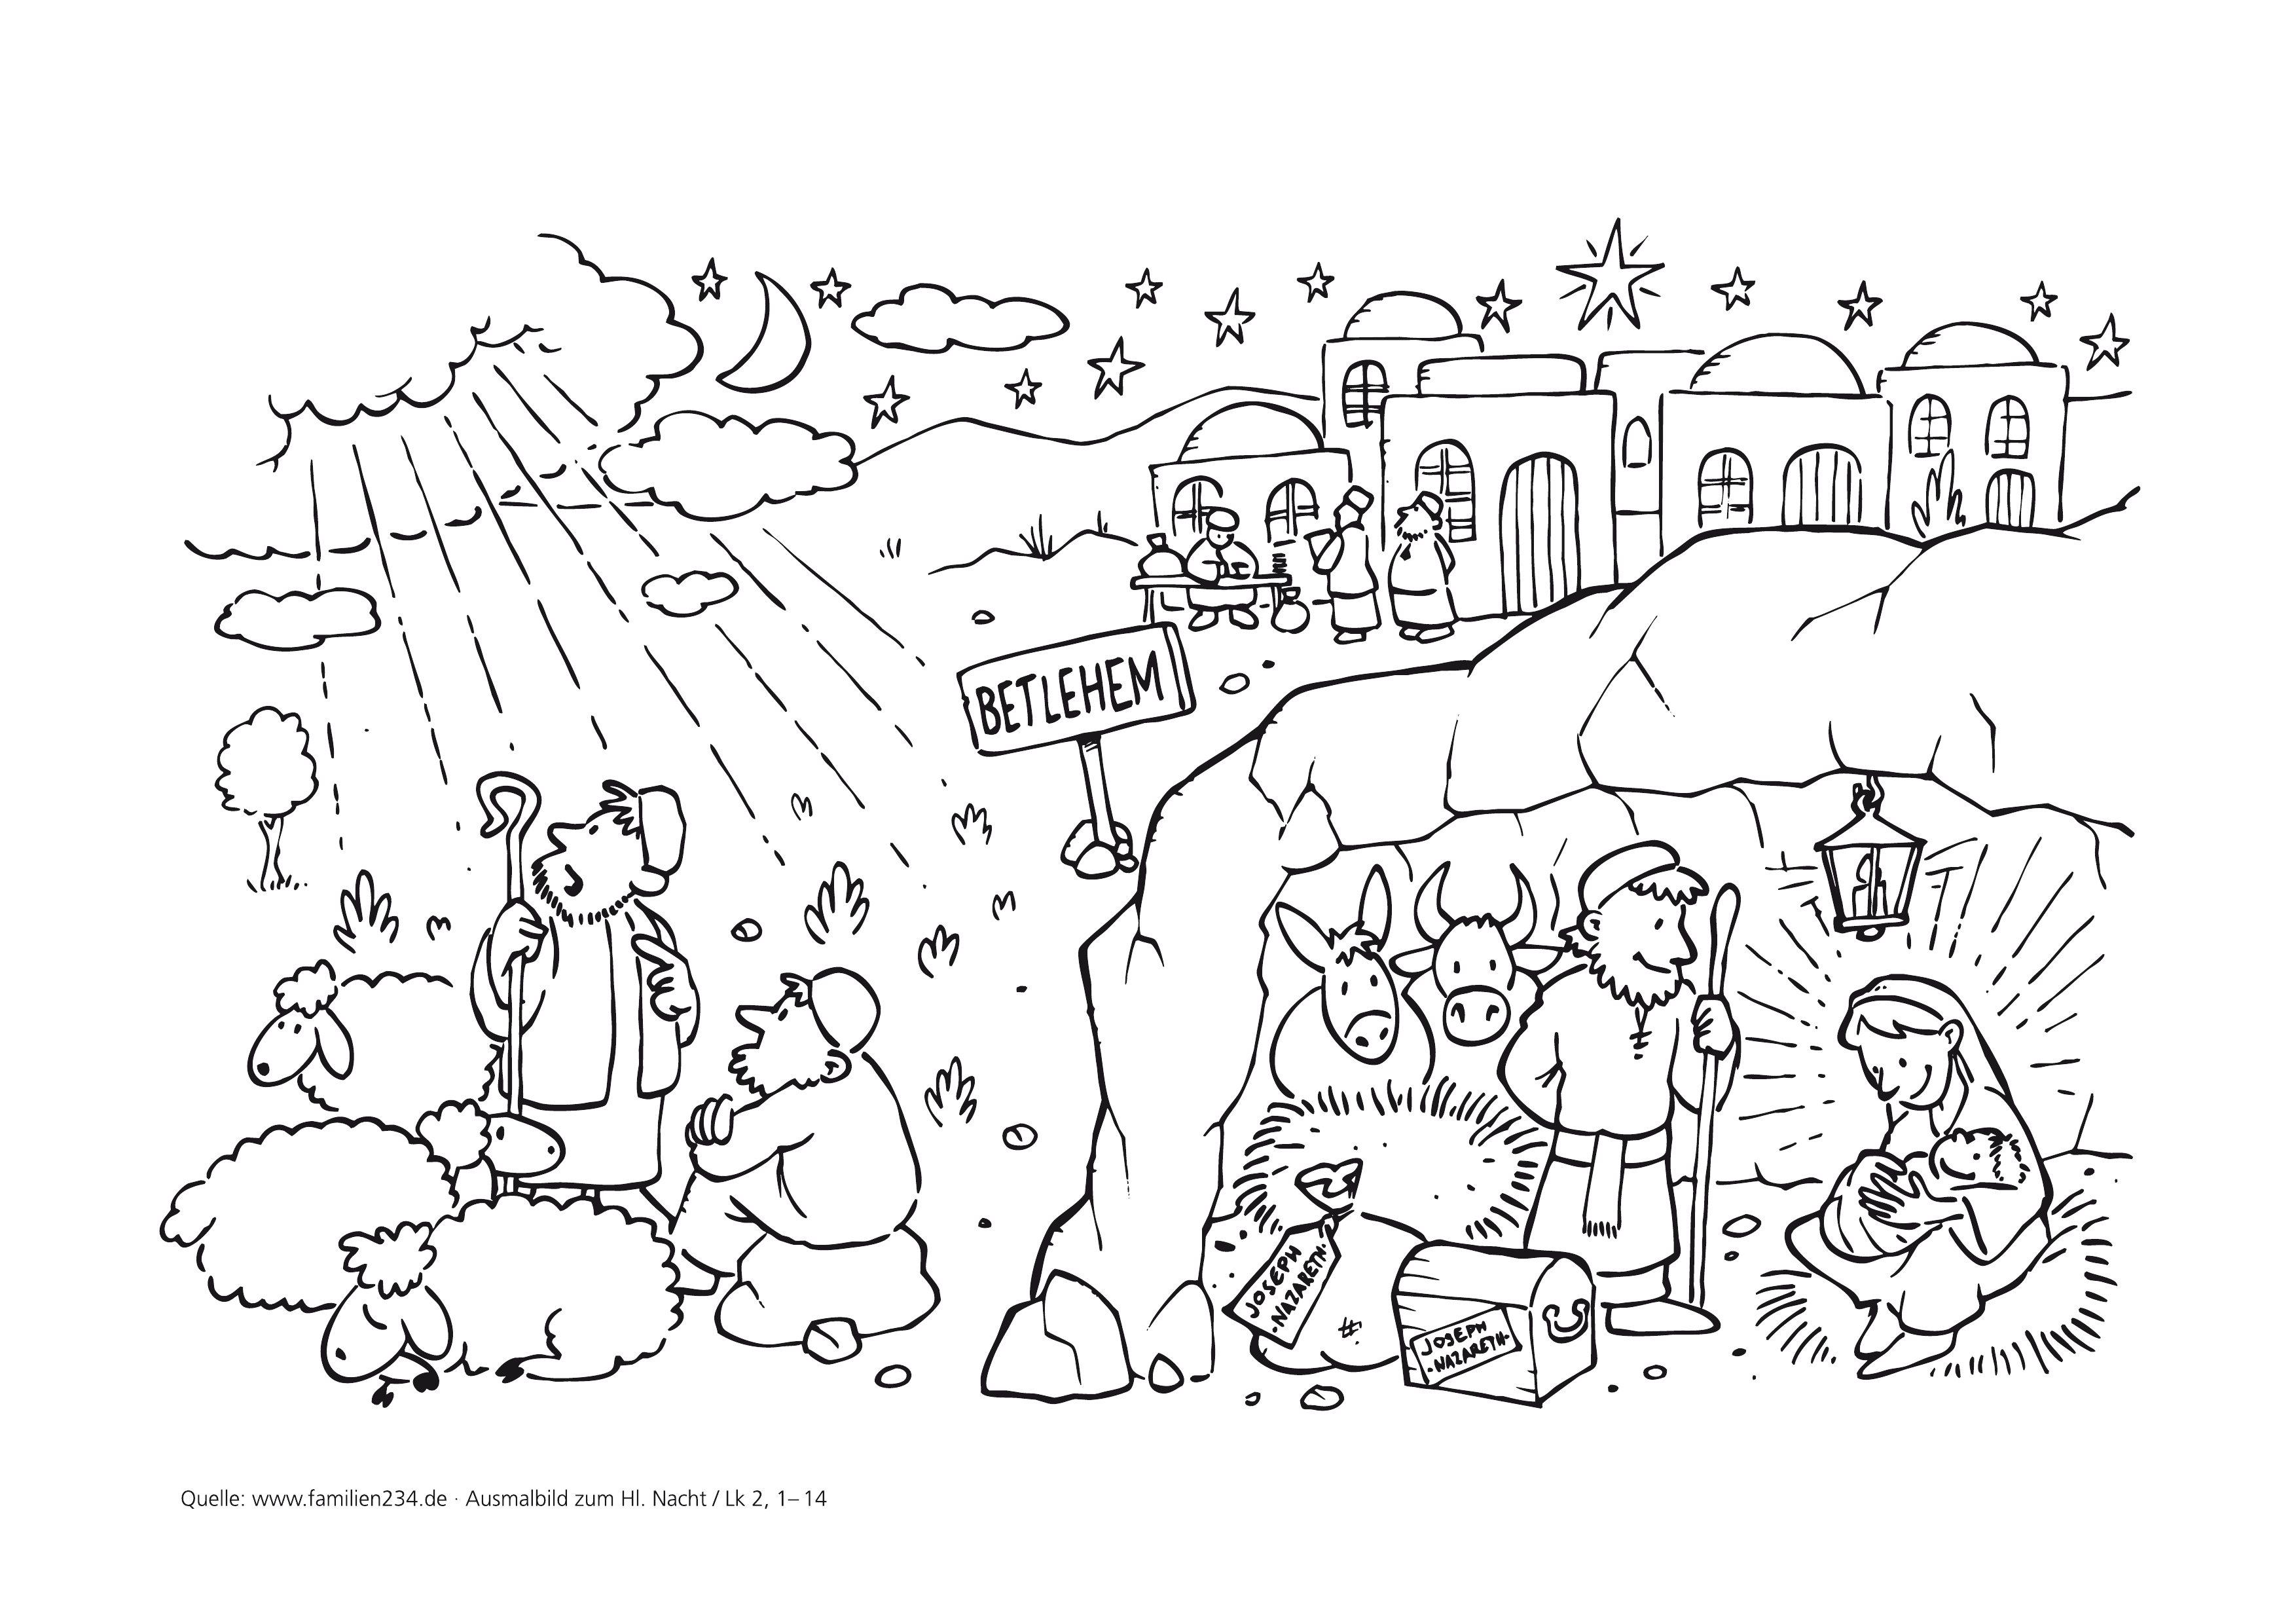 Ausmalbild zum ausdrucken ausmalbild by bibelbildde pfarr